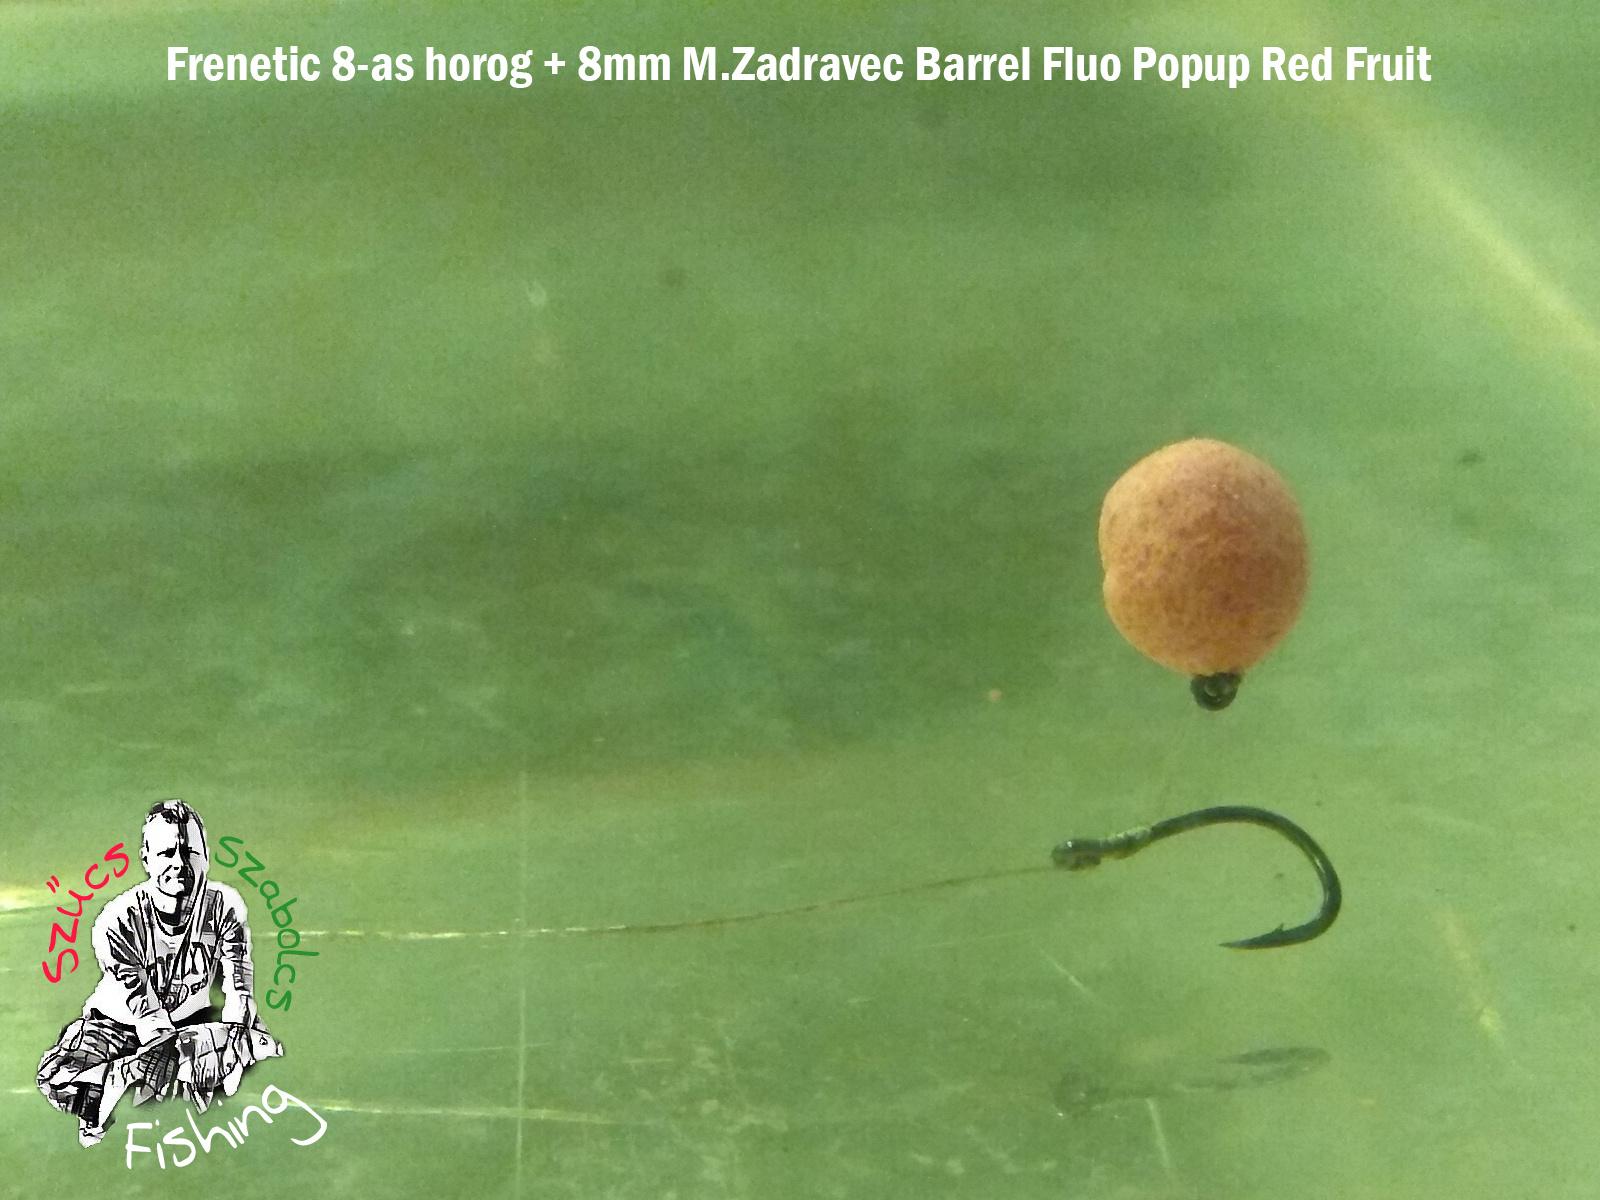 Frenetic-8-as-horog-8mm-MZ-Barrel-Fluo-Popup-Red-Fruit-IMG_20180131_185120